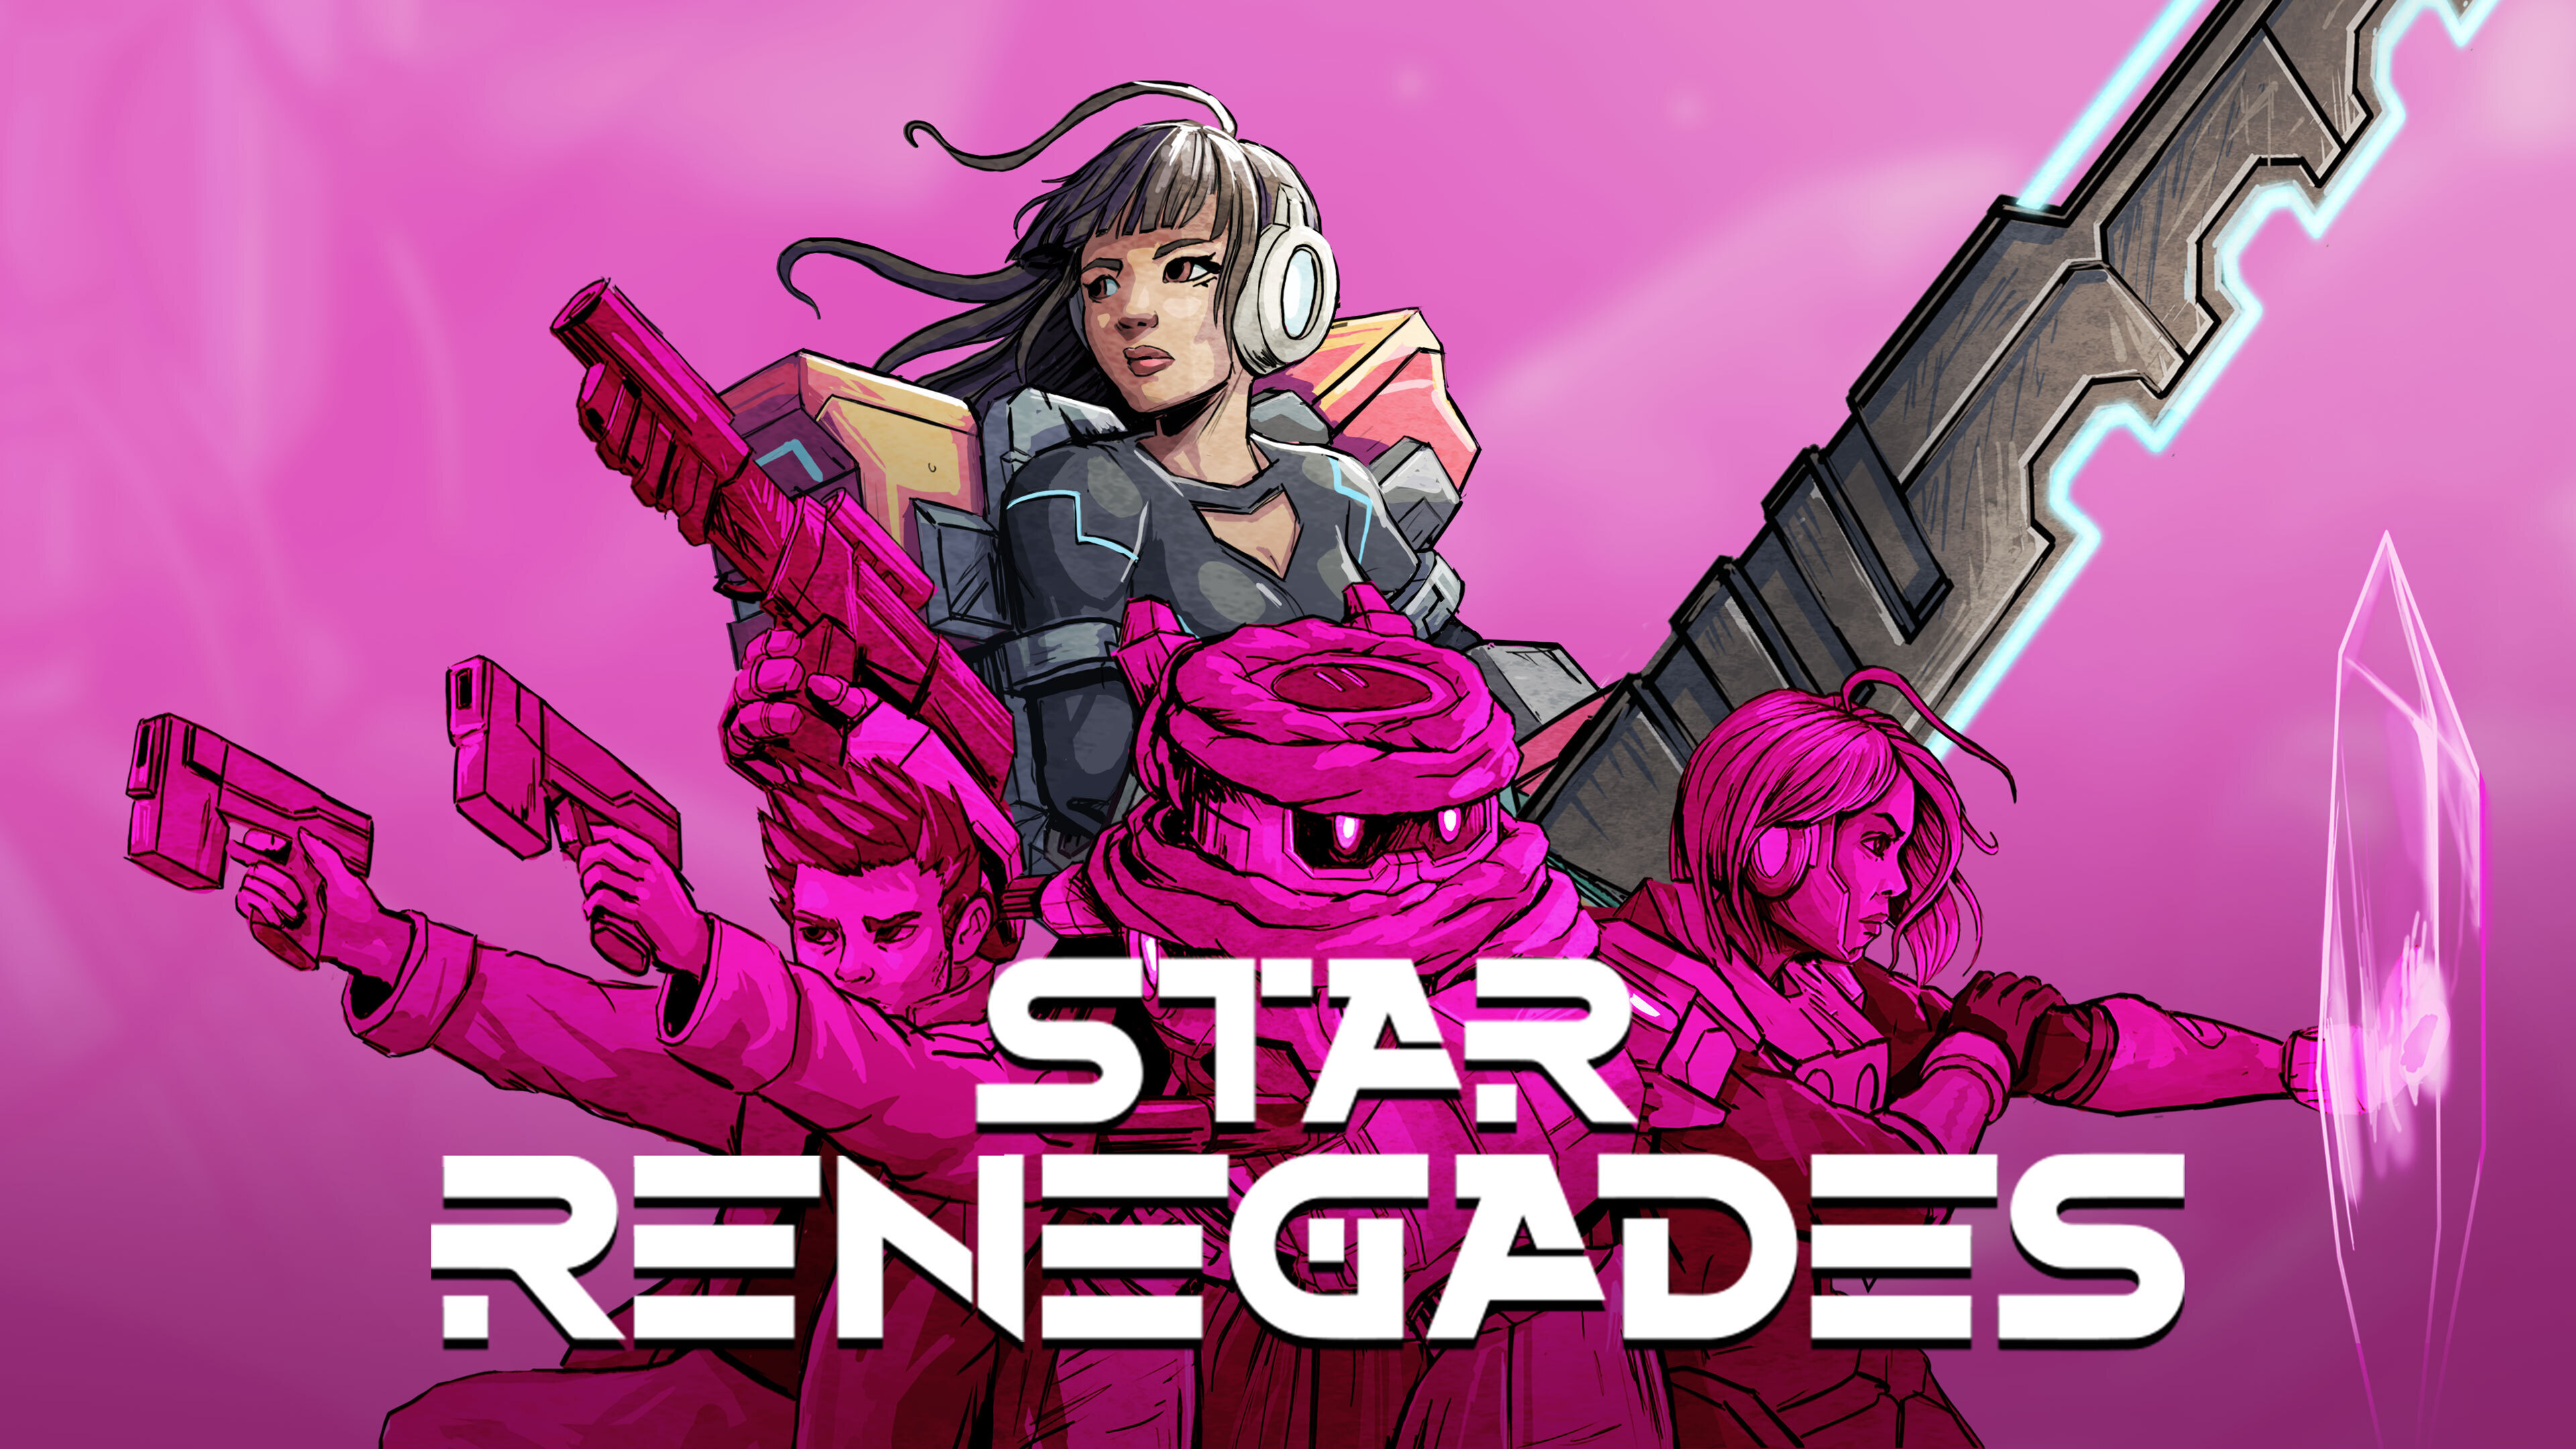 StarRenegadesKeyArt2Walpaper4k